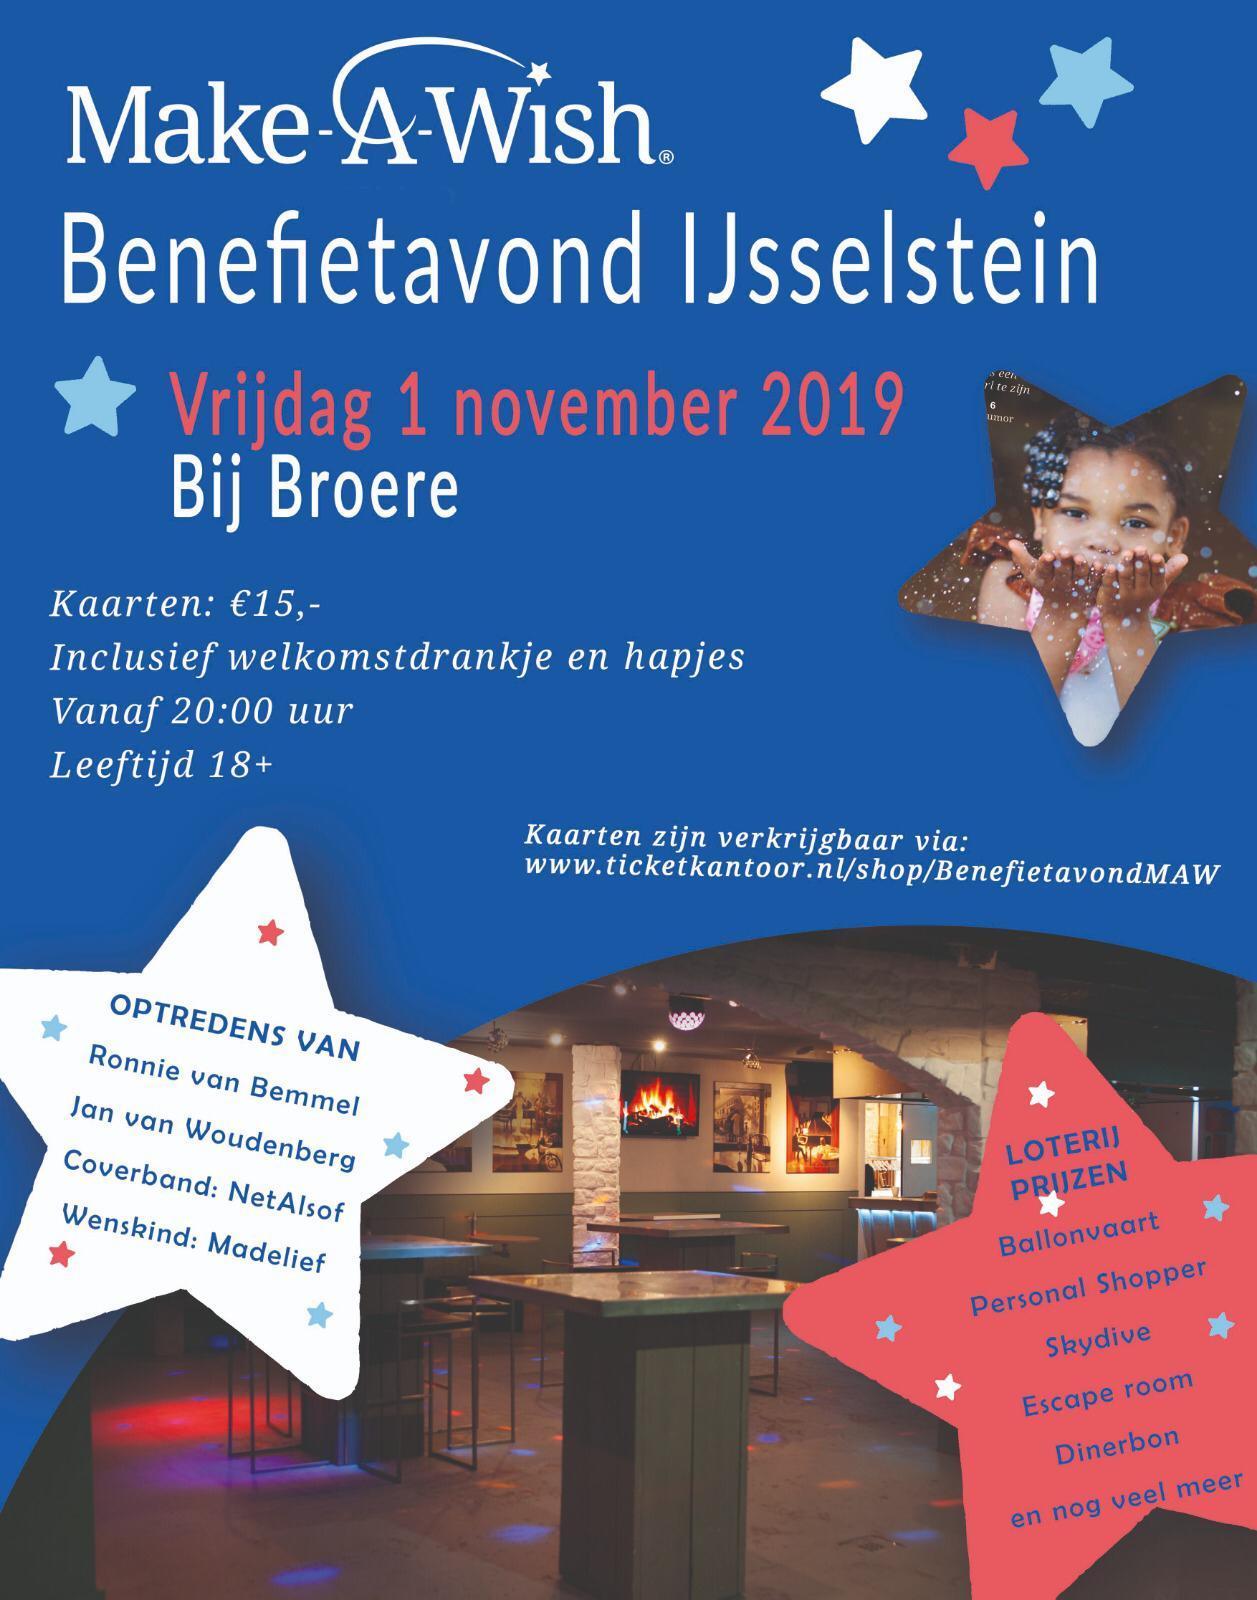 Make-A-Wish Benefietavond bij Broere 1 November 2019